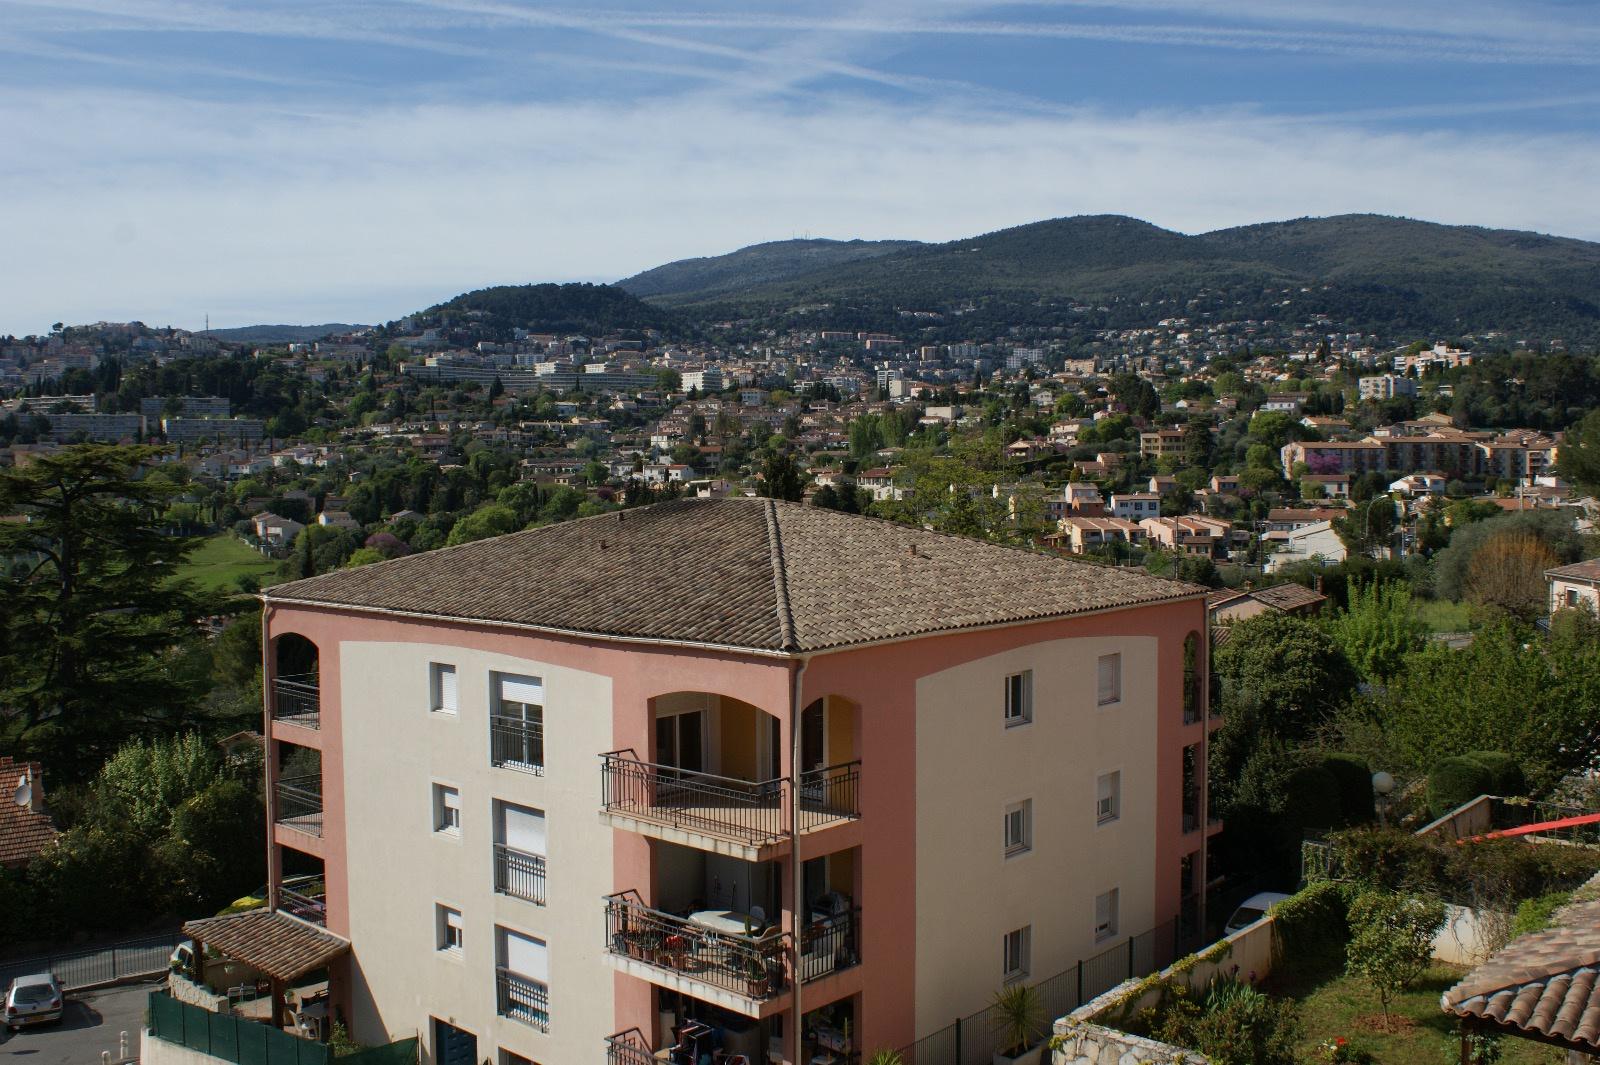 Plan Cul Marseille: Rencontre Une Salope De Marseille